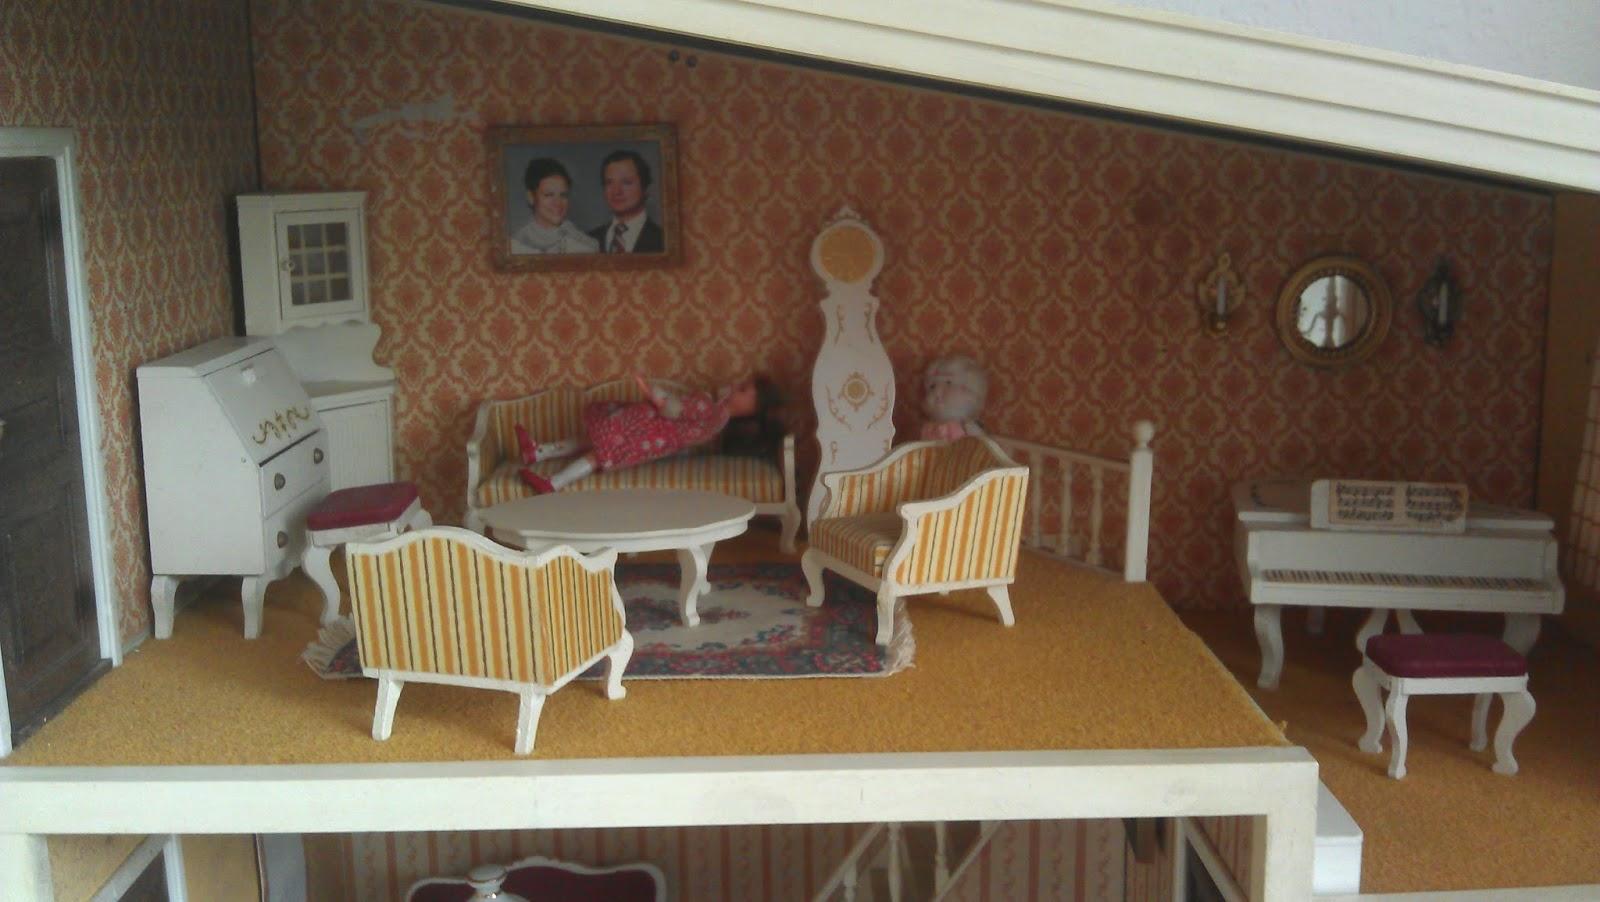 augenblick mal lundby puppenhaus. Black Bedroom Furniture Sets. Home Design Ideas